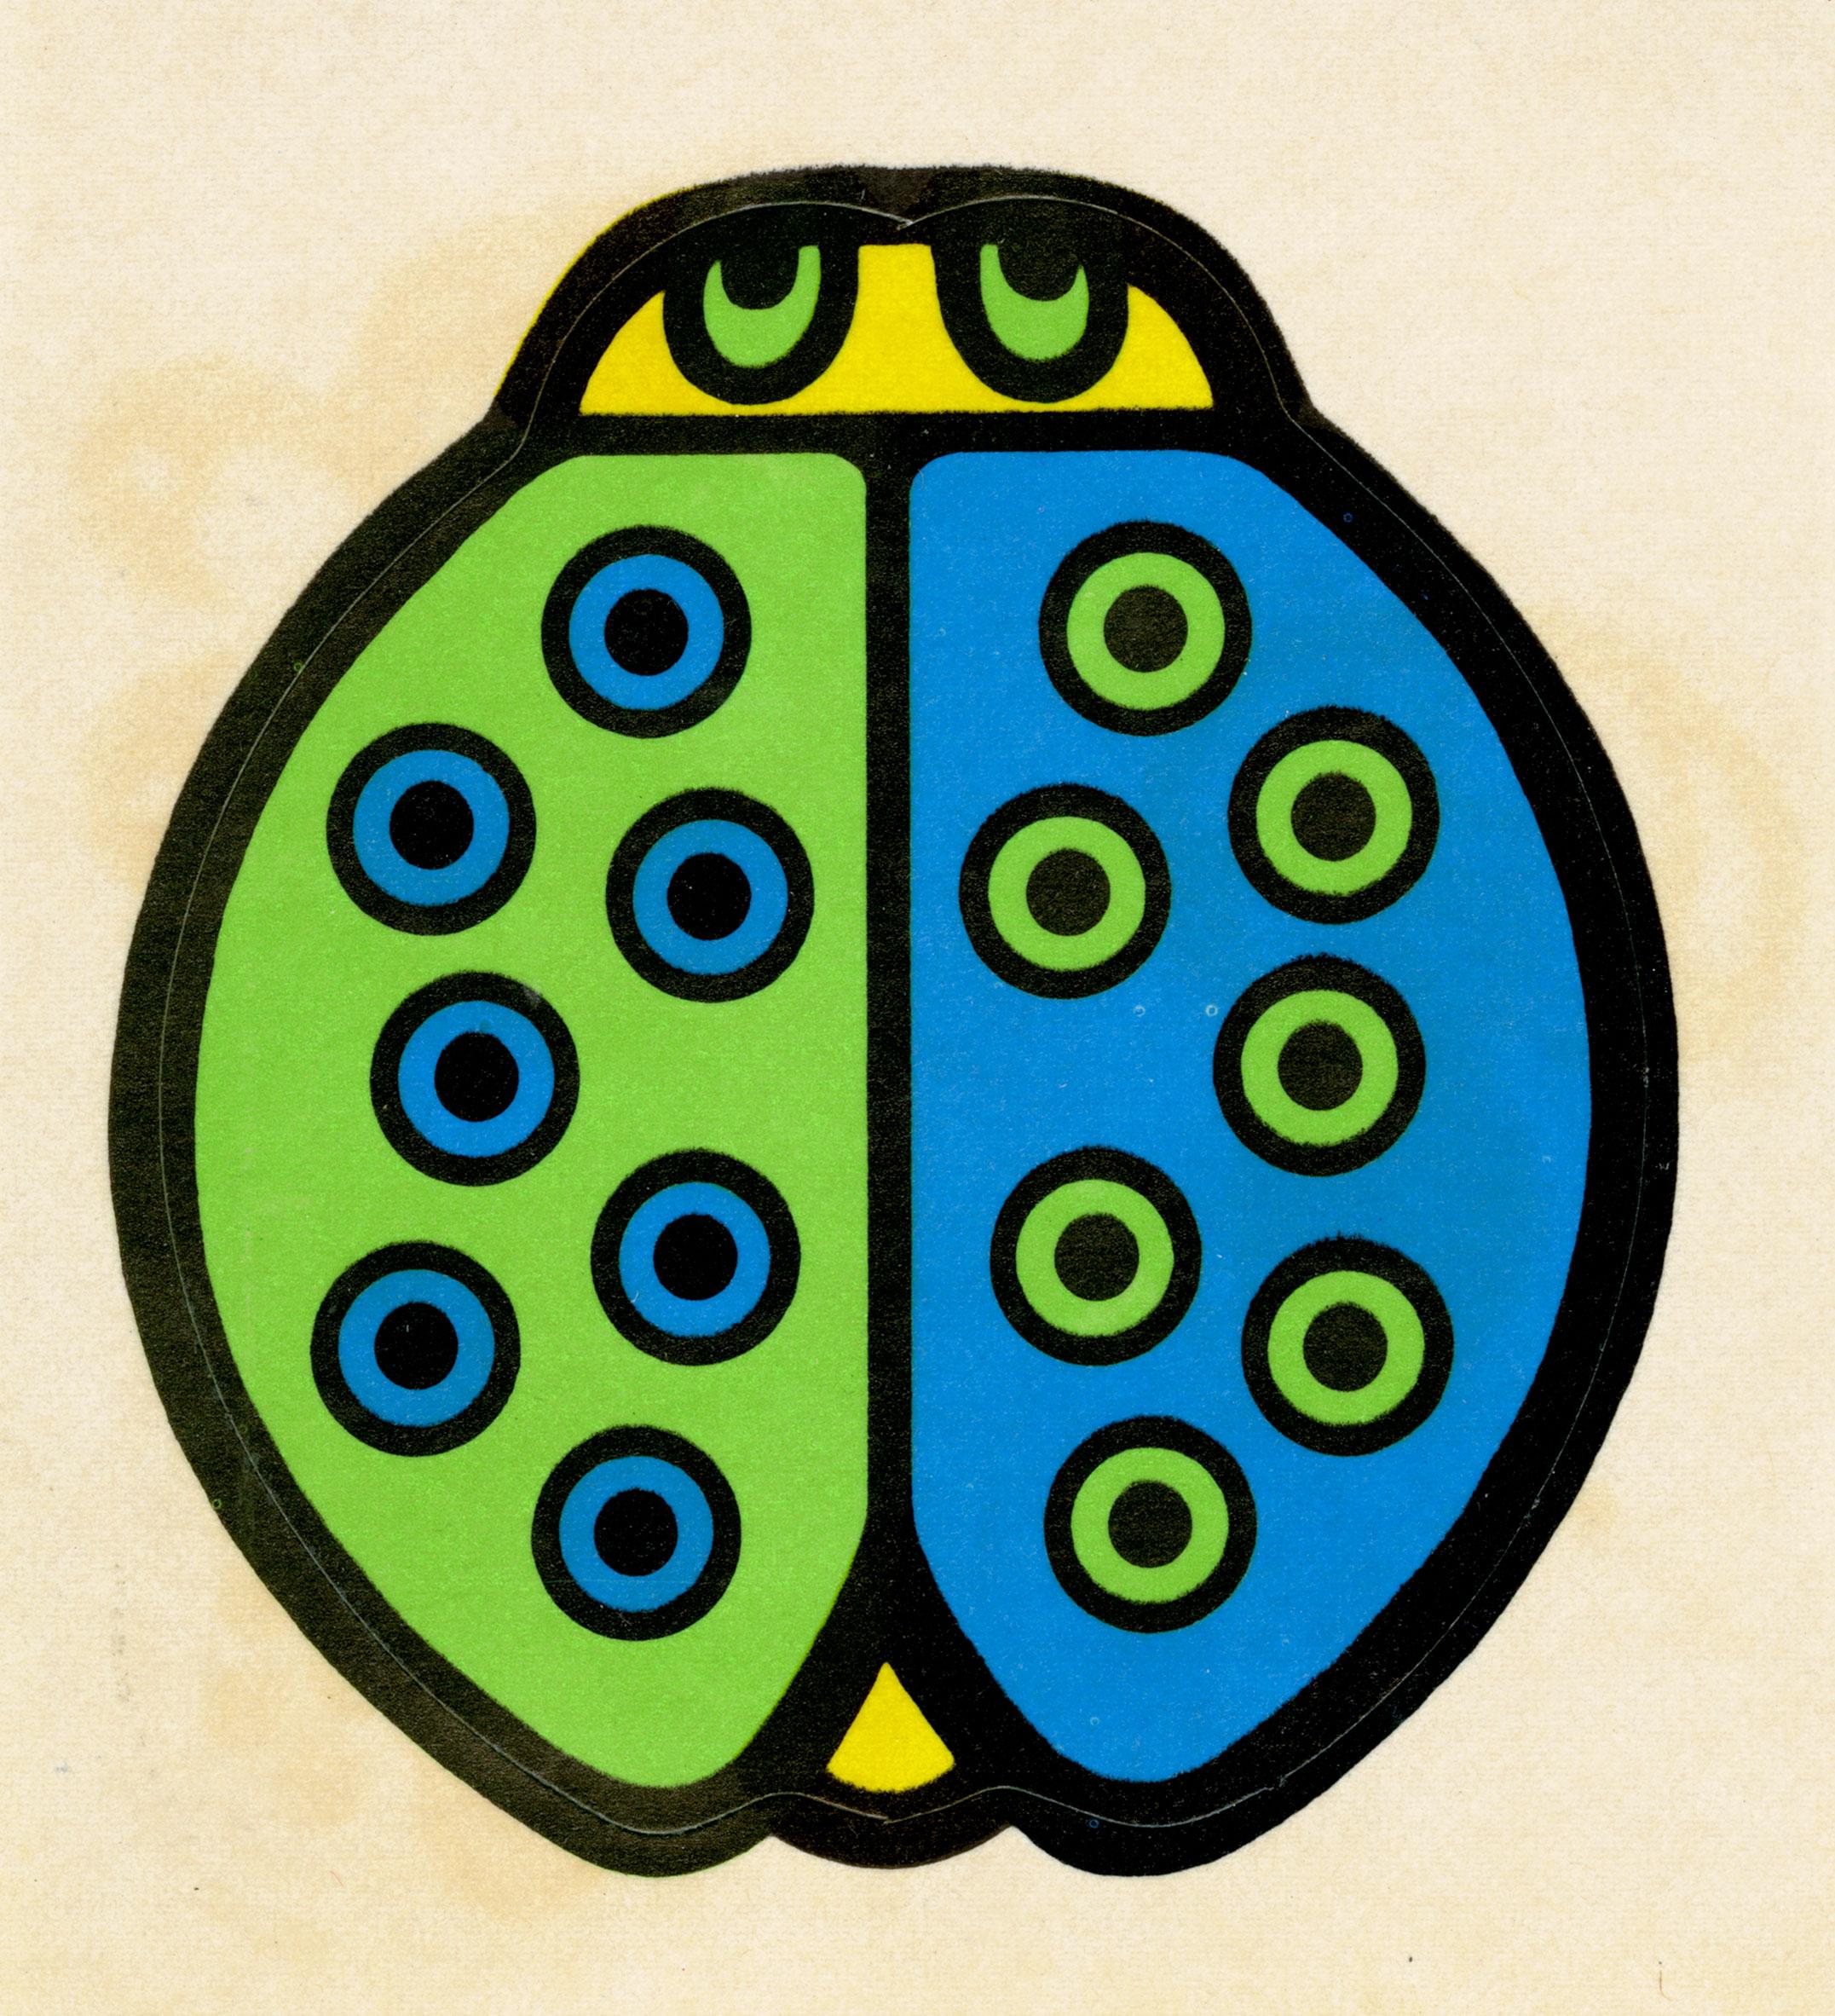 pippins-ladybug.jpg